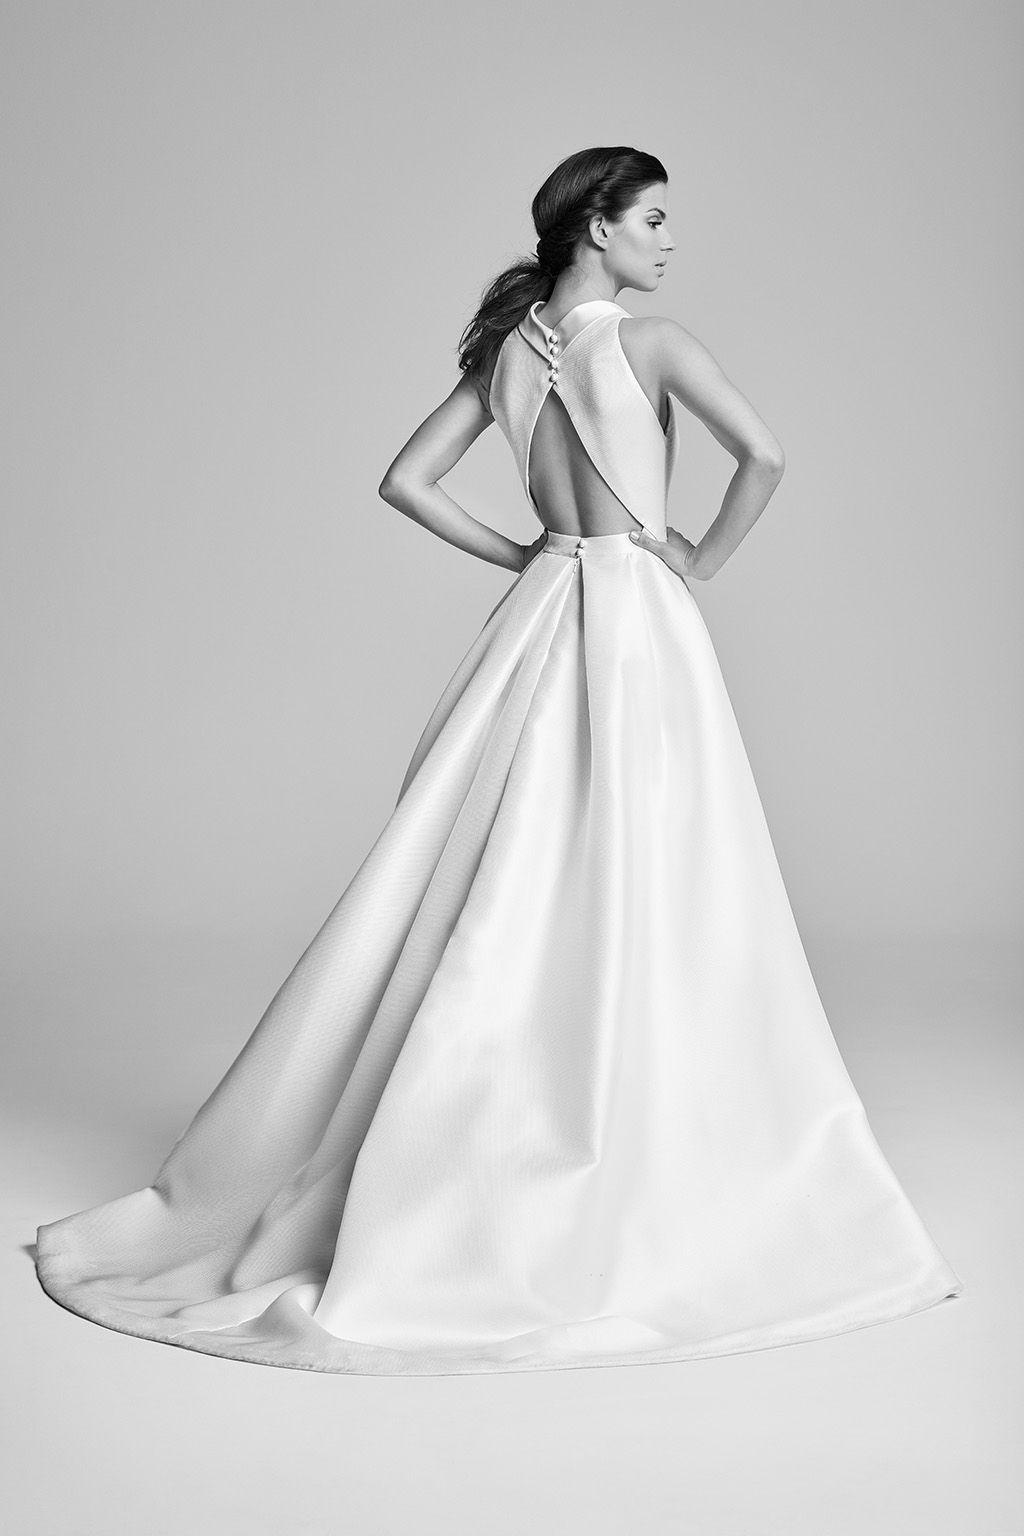 Swanson (Back | Pinterest | Belle epoque, Bridal gowns and Belle